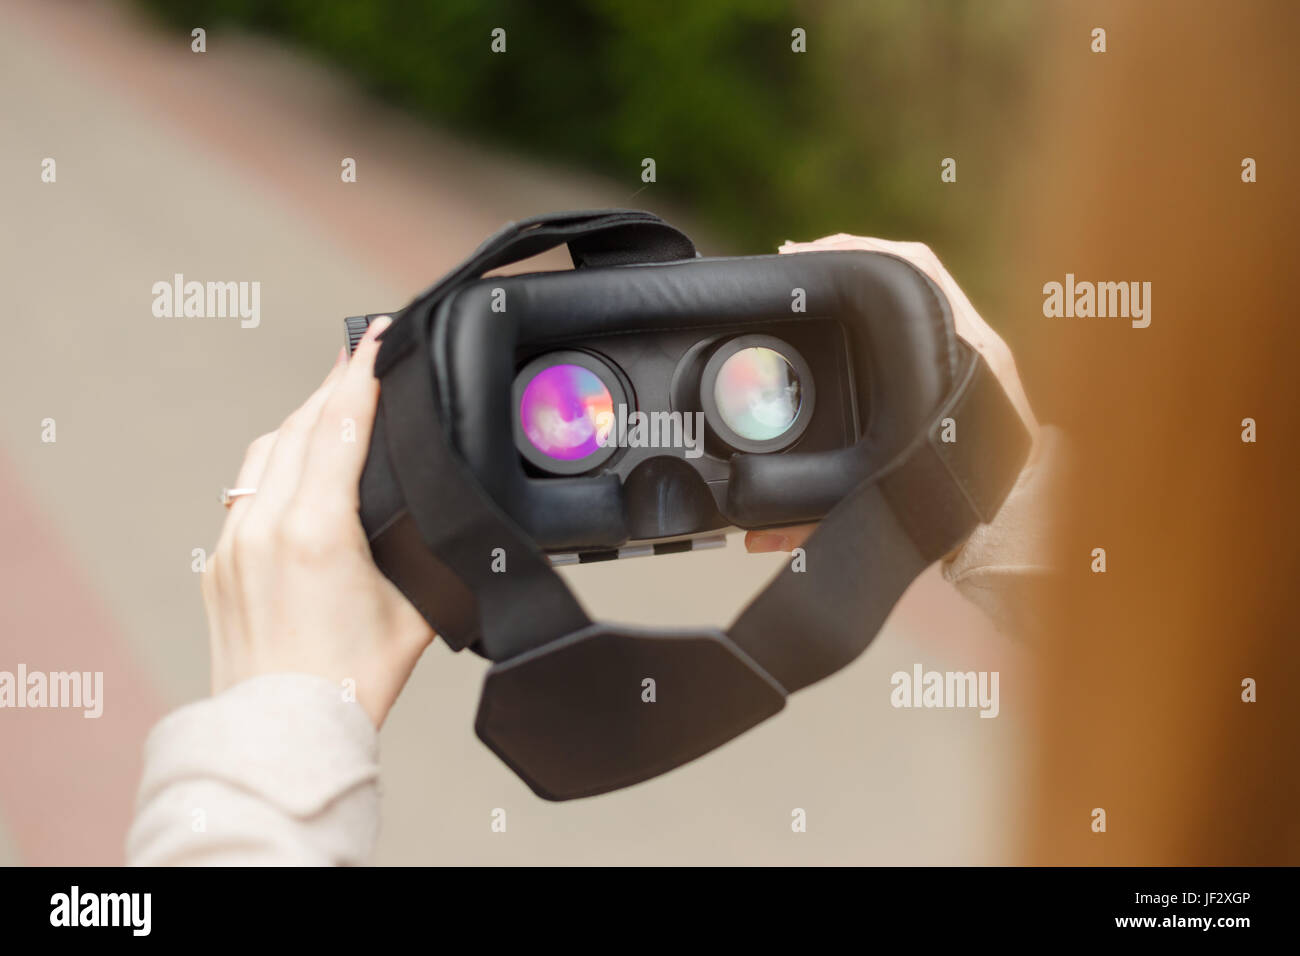 La technologie moderne en casque vr femme mains. Banque D'Images